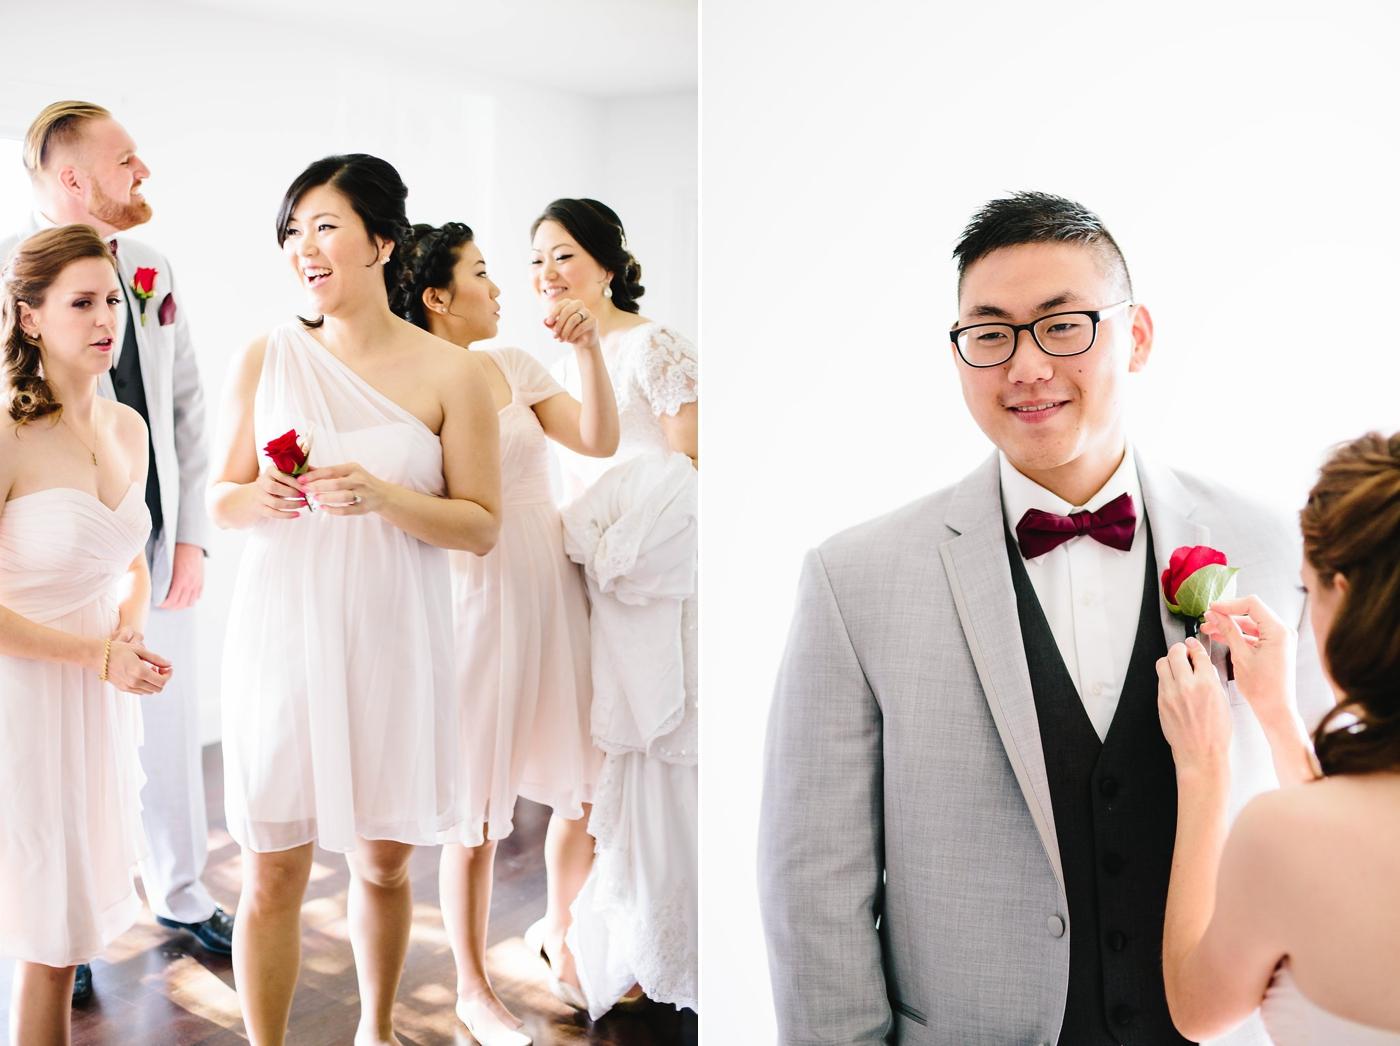 chicago-fine-art-wedding-photography-bolotin8